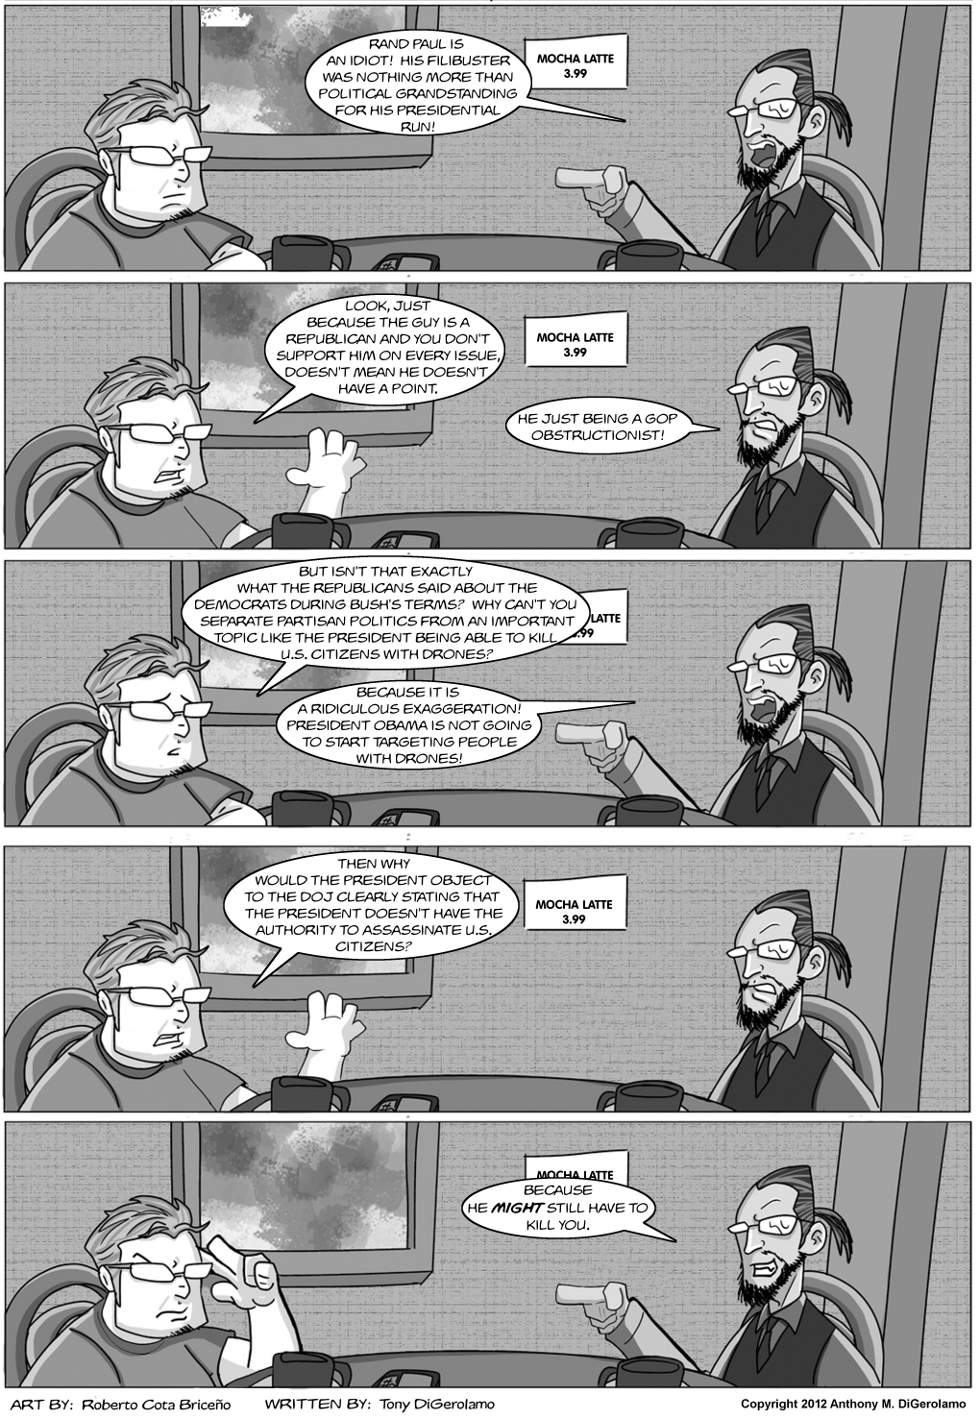 The Antiwar Comic: The Drone Debate